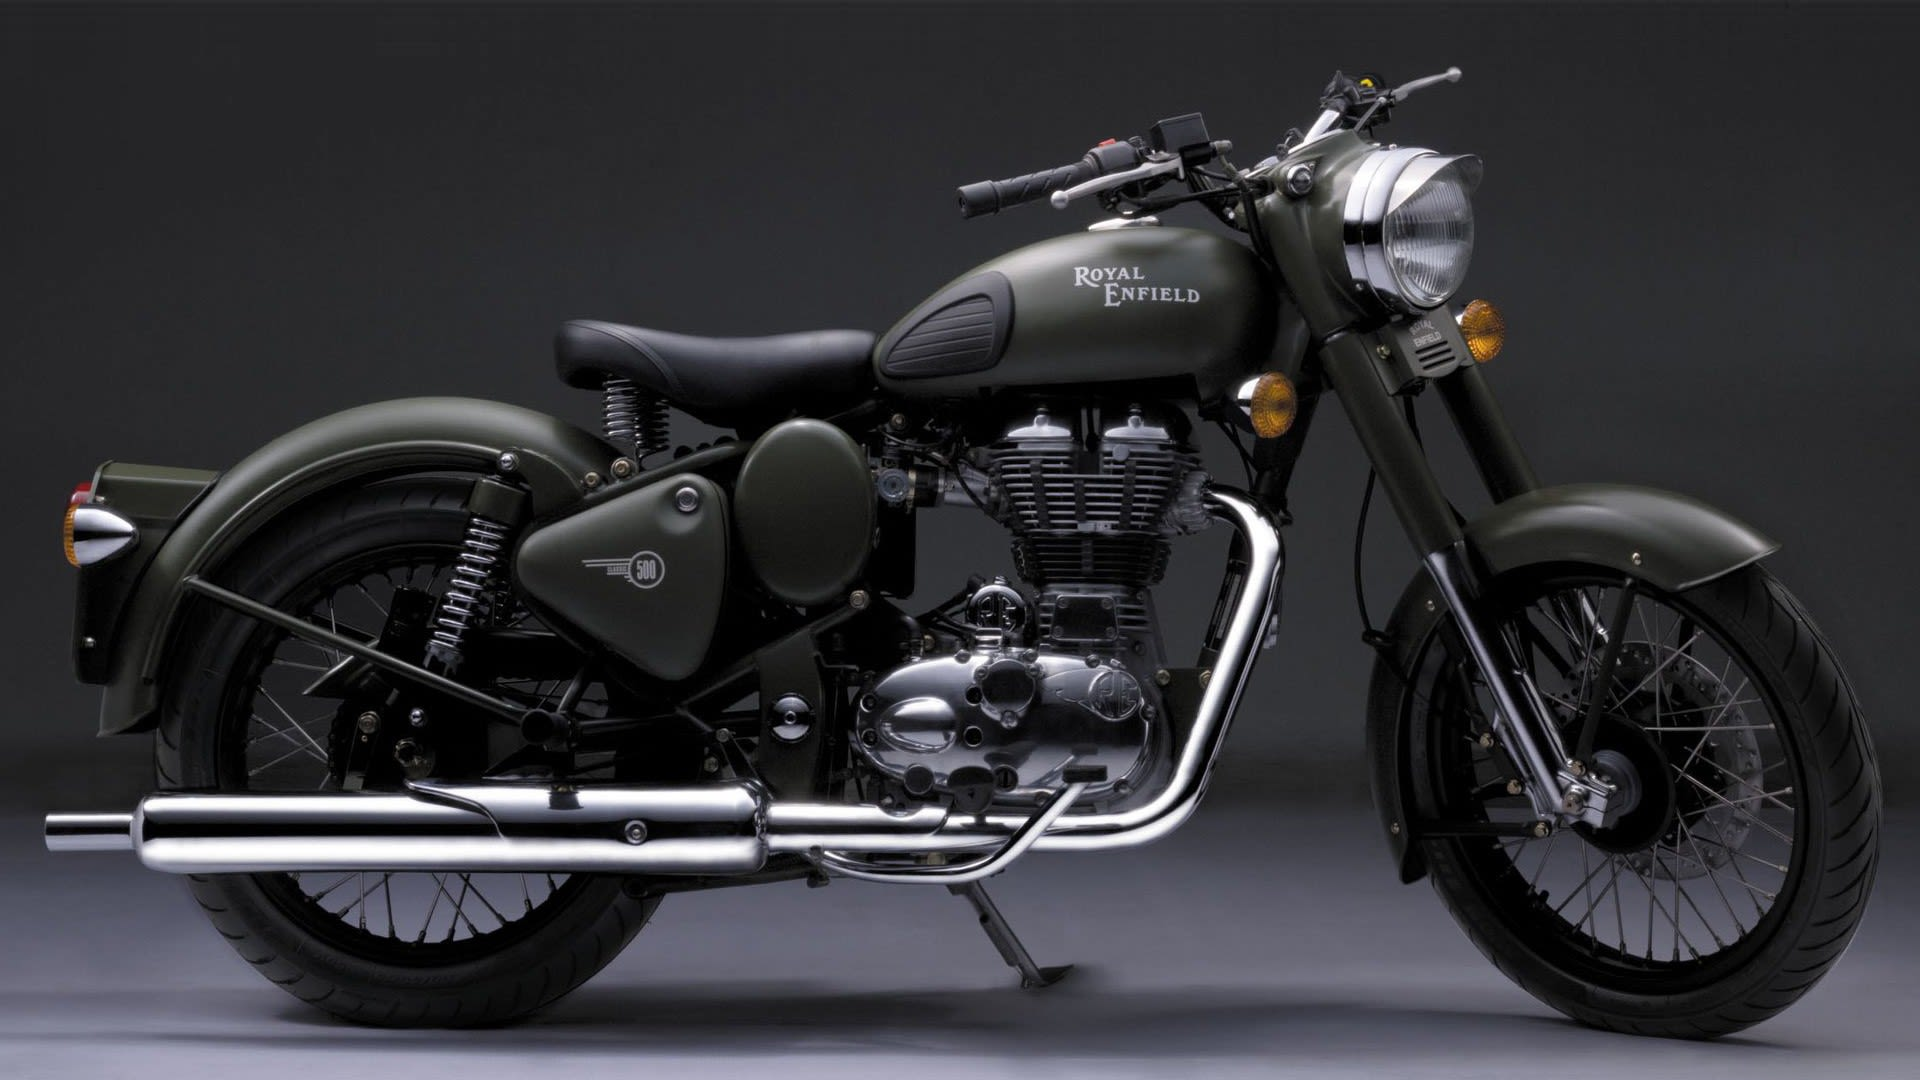 classic 350 on rent in dehradun. bike on rent in dehradun. bike rental uttarakhand